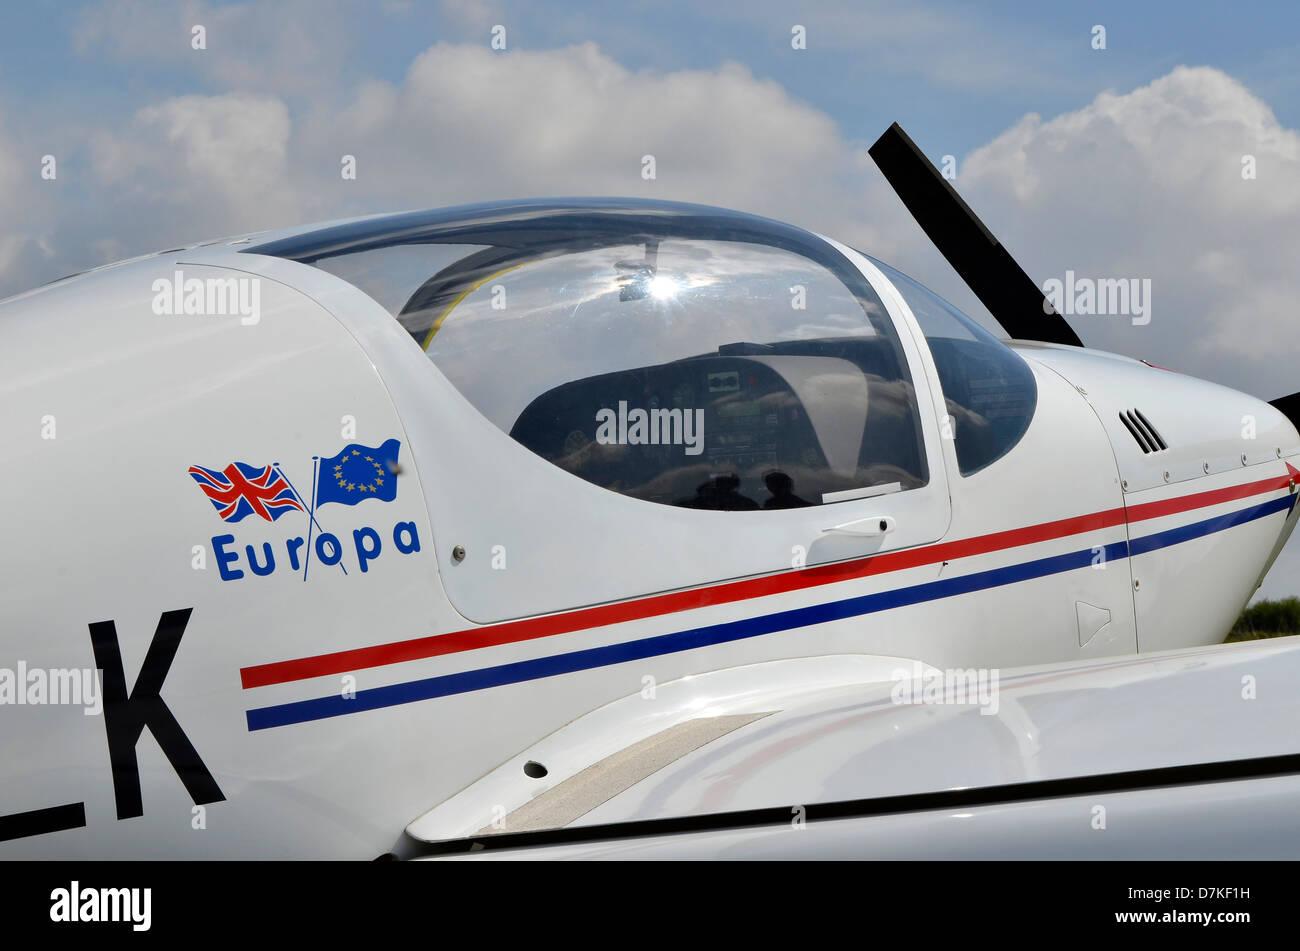 Home built modern light aircraft, a Europa Classic  a British kitplane produced by Europa Aircraft (2004) Ltd - Stock Image